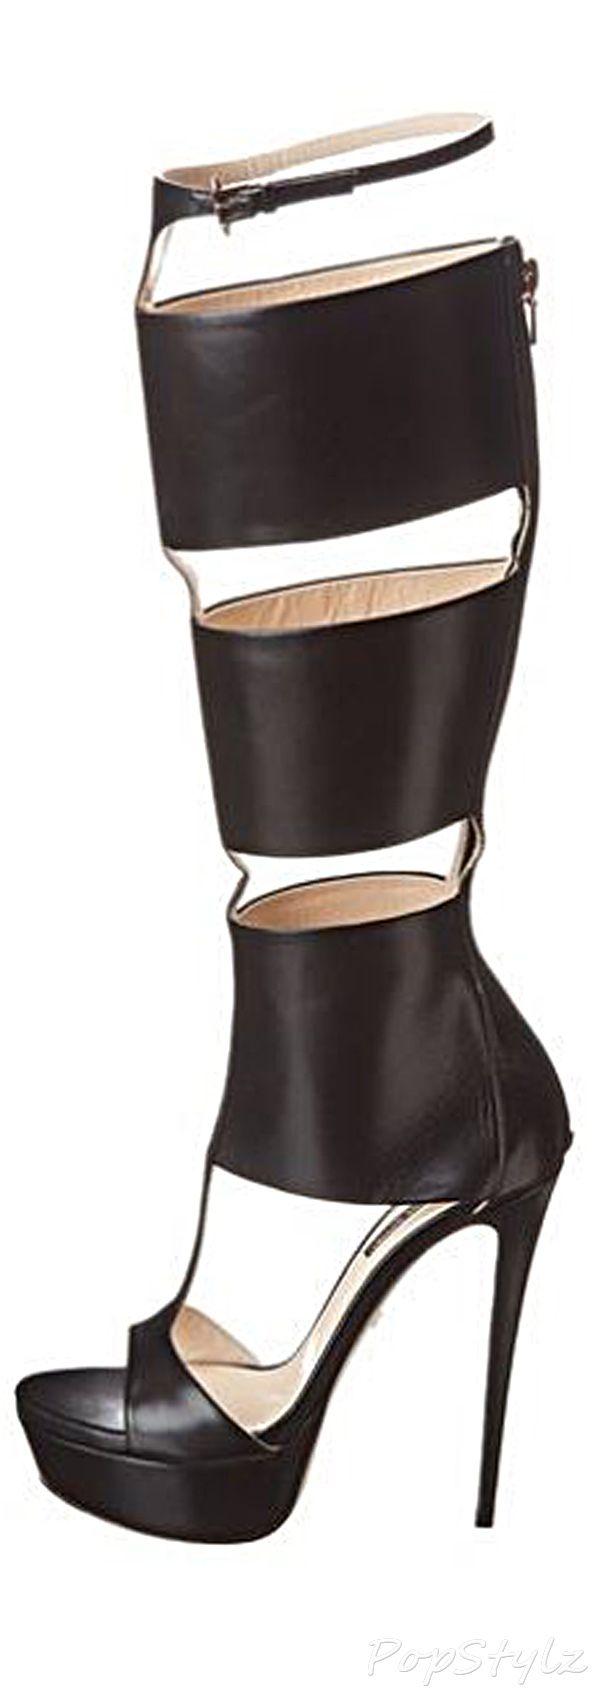 Ruthie Davis Stefani Over-the-Knee Italian Leather Boot